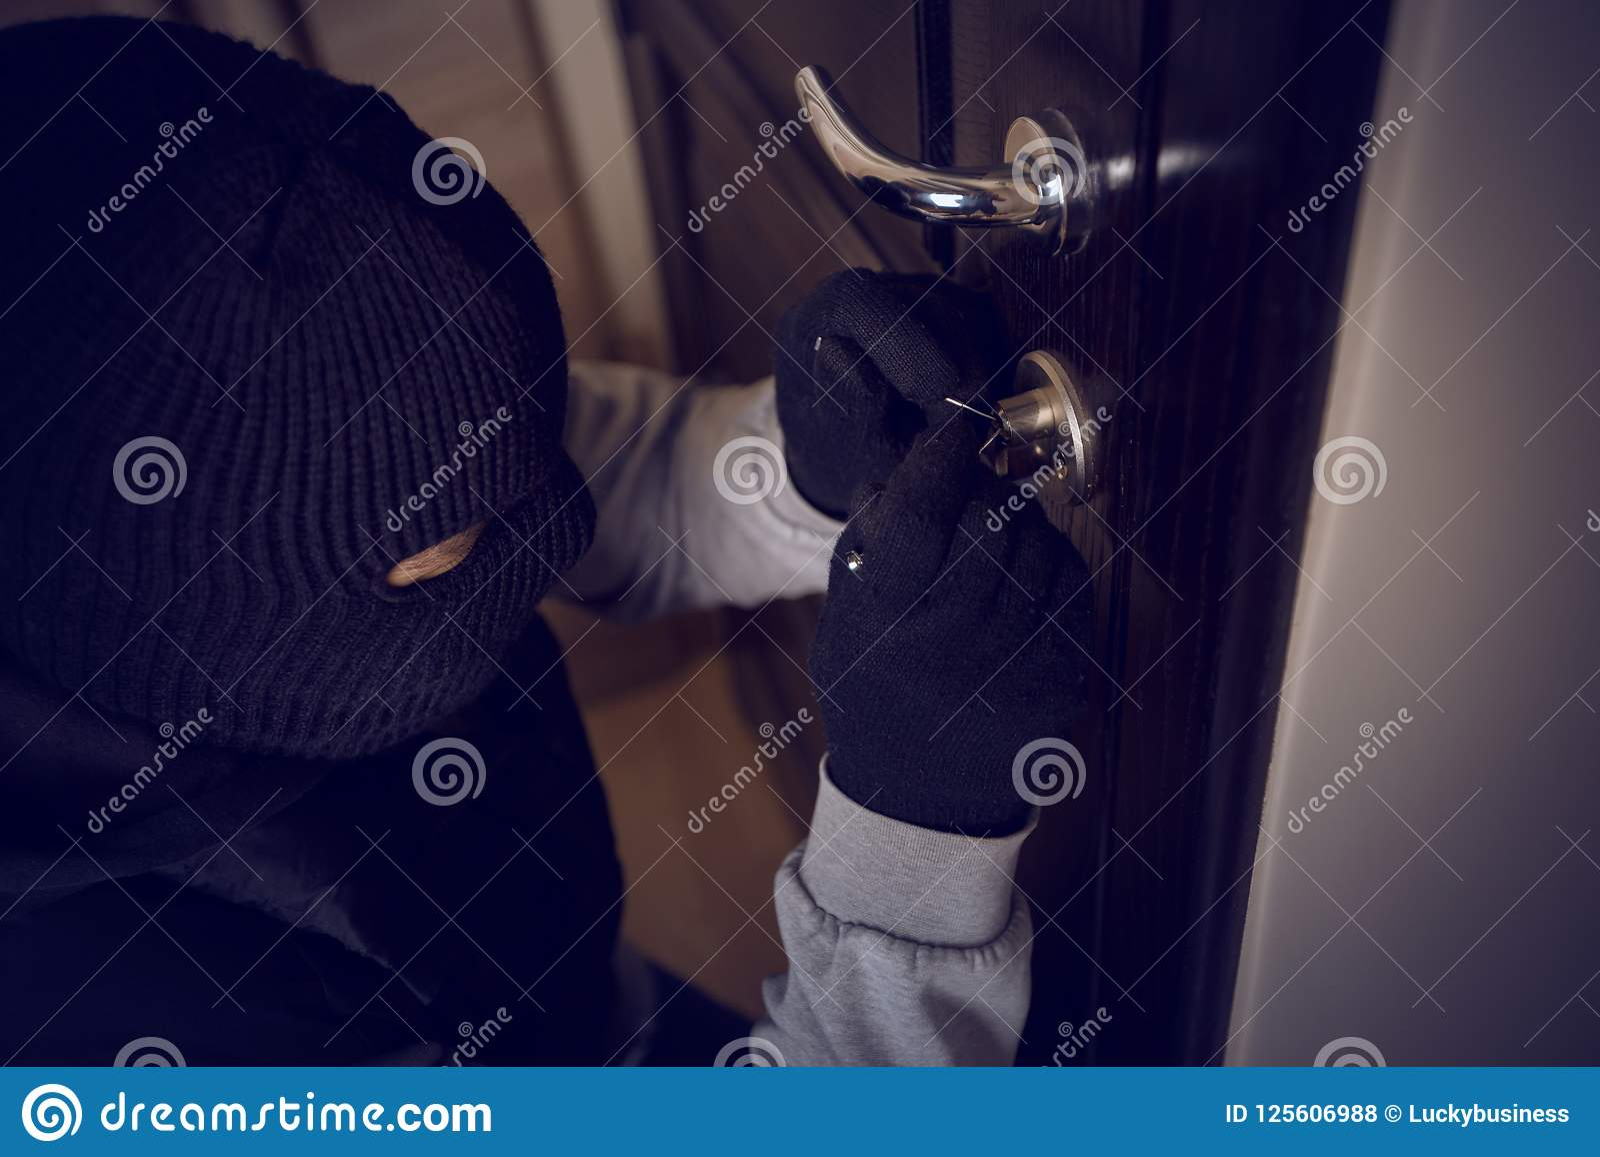 Burglar breaking into the lock